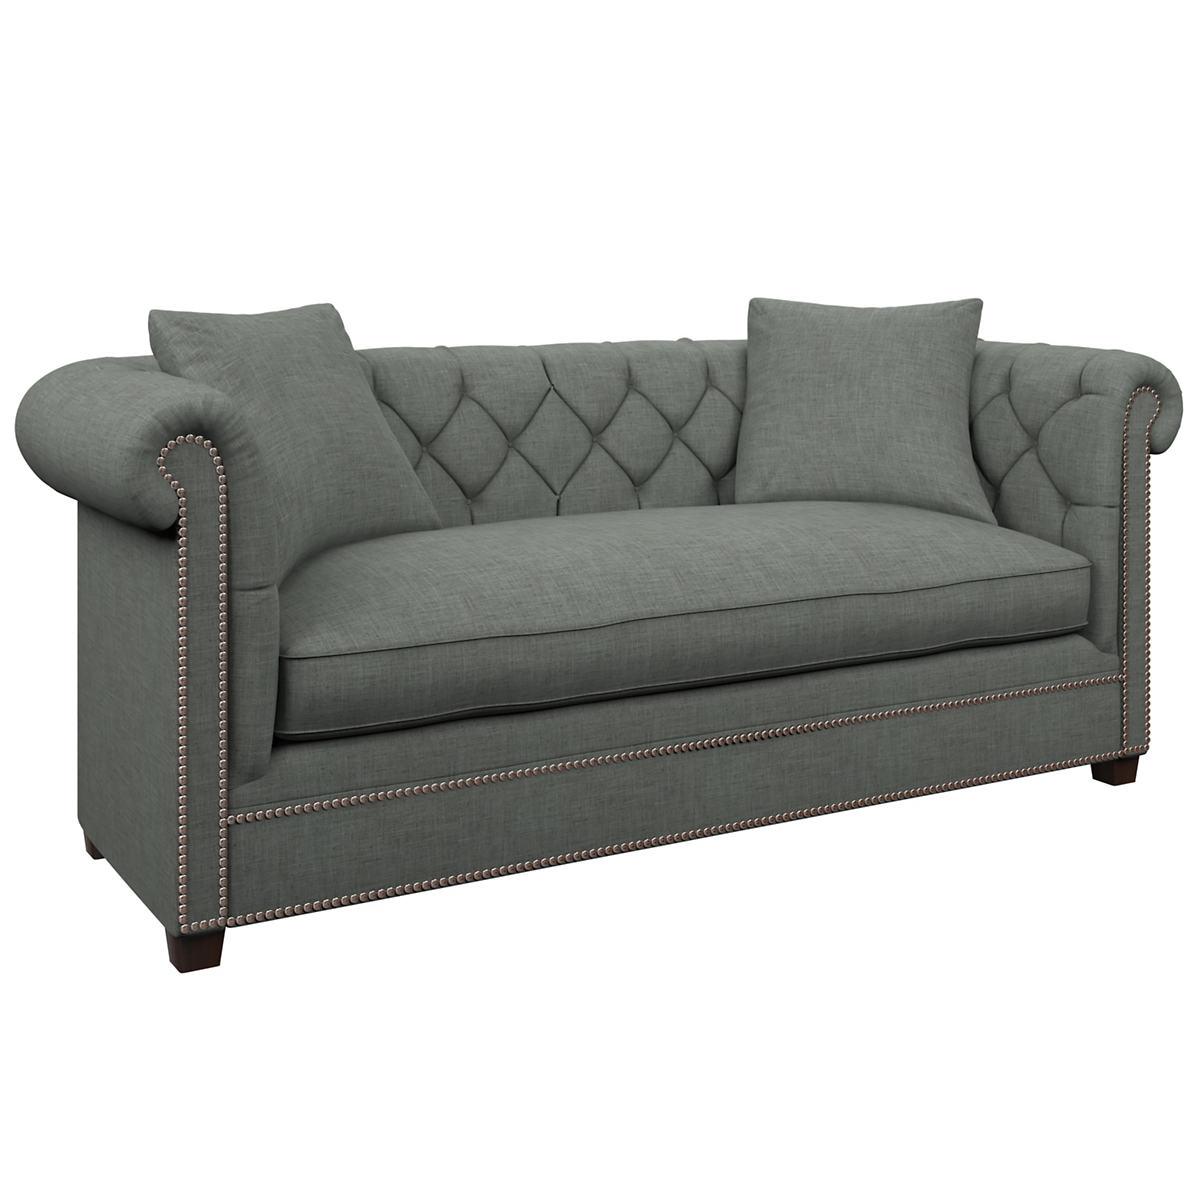 Canvasuede Ocean Richmond Sofa